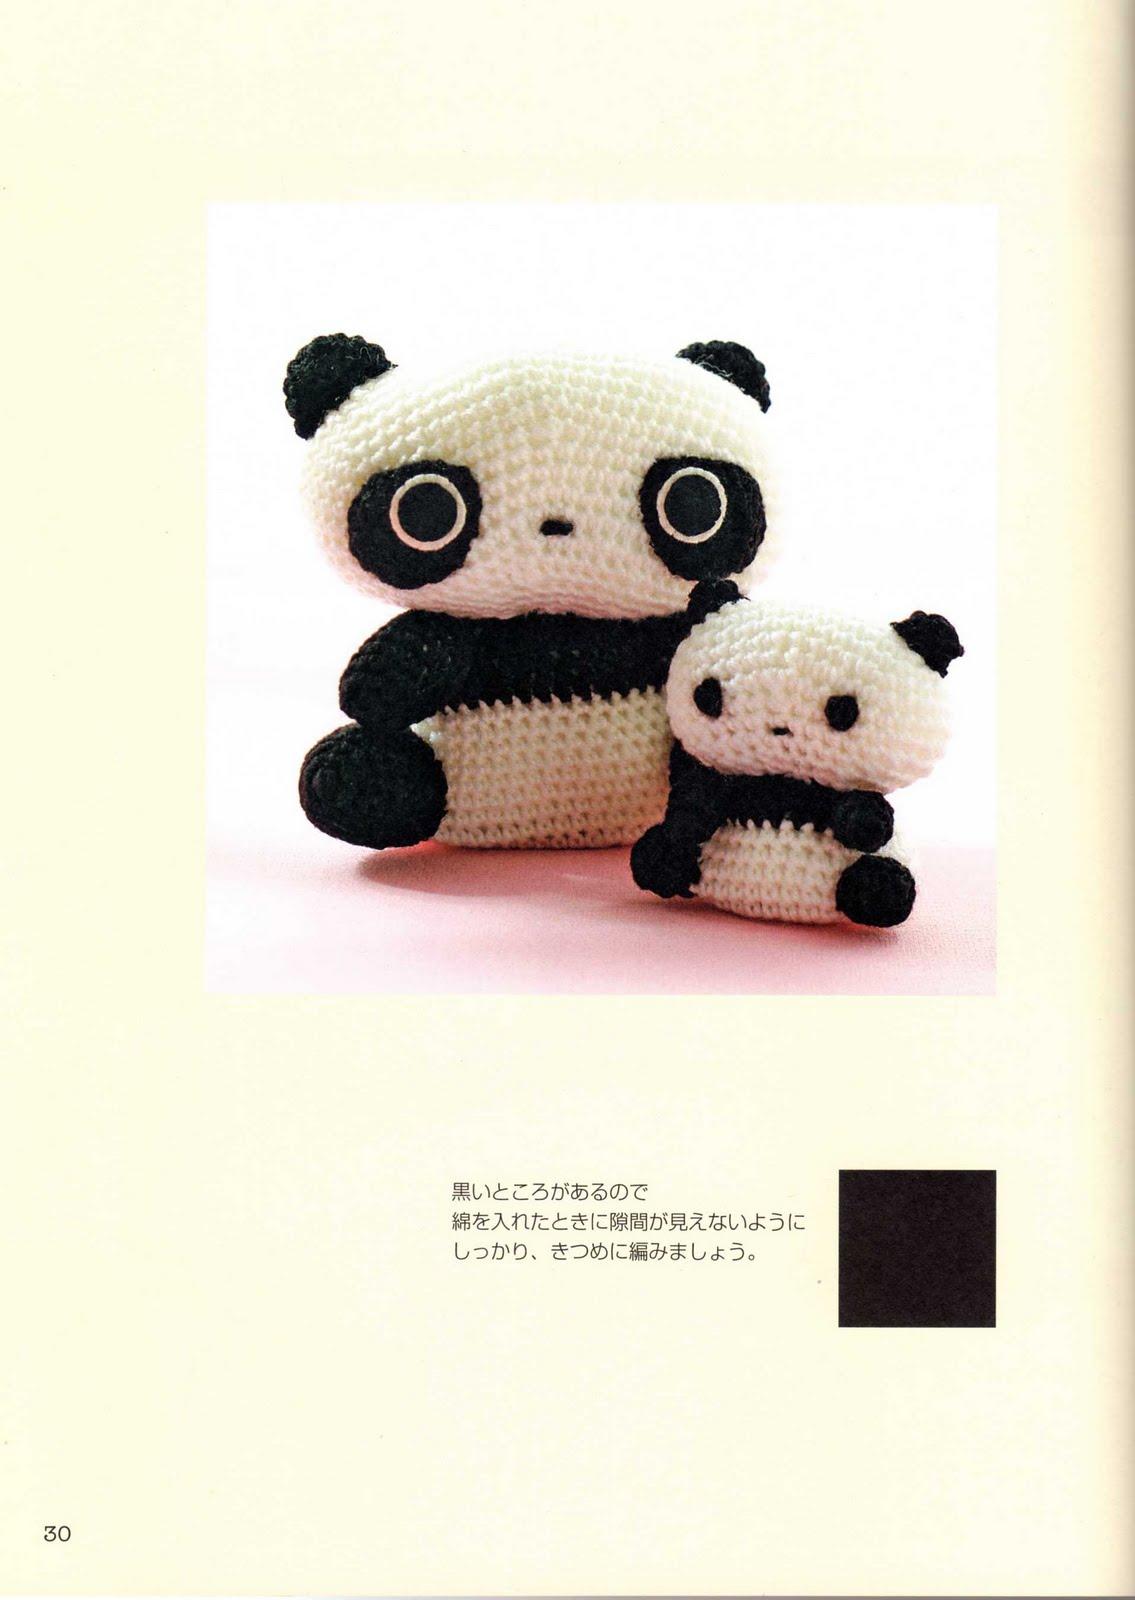 Dolce panda schema amigurumi (1) - magiedifilo.it punto ...